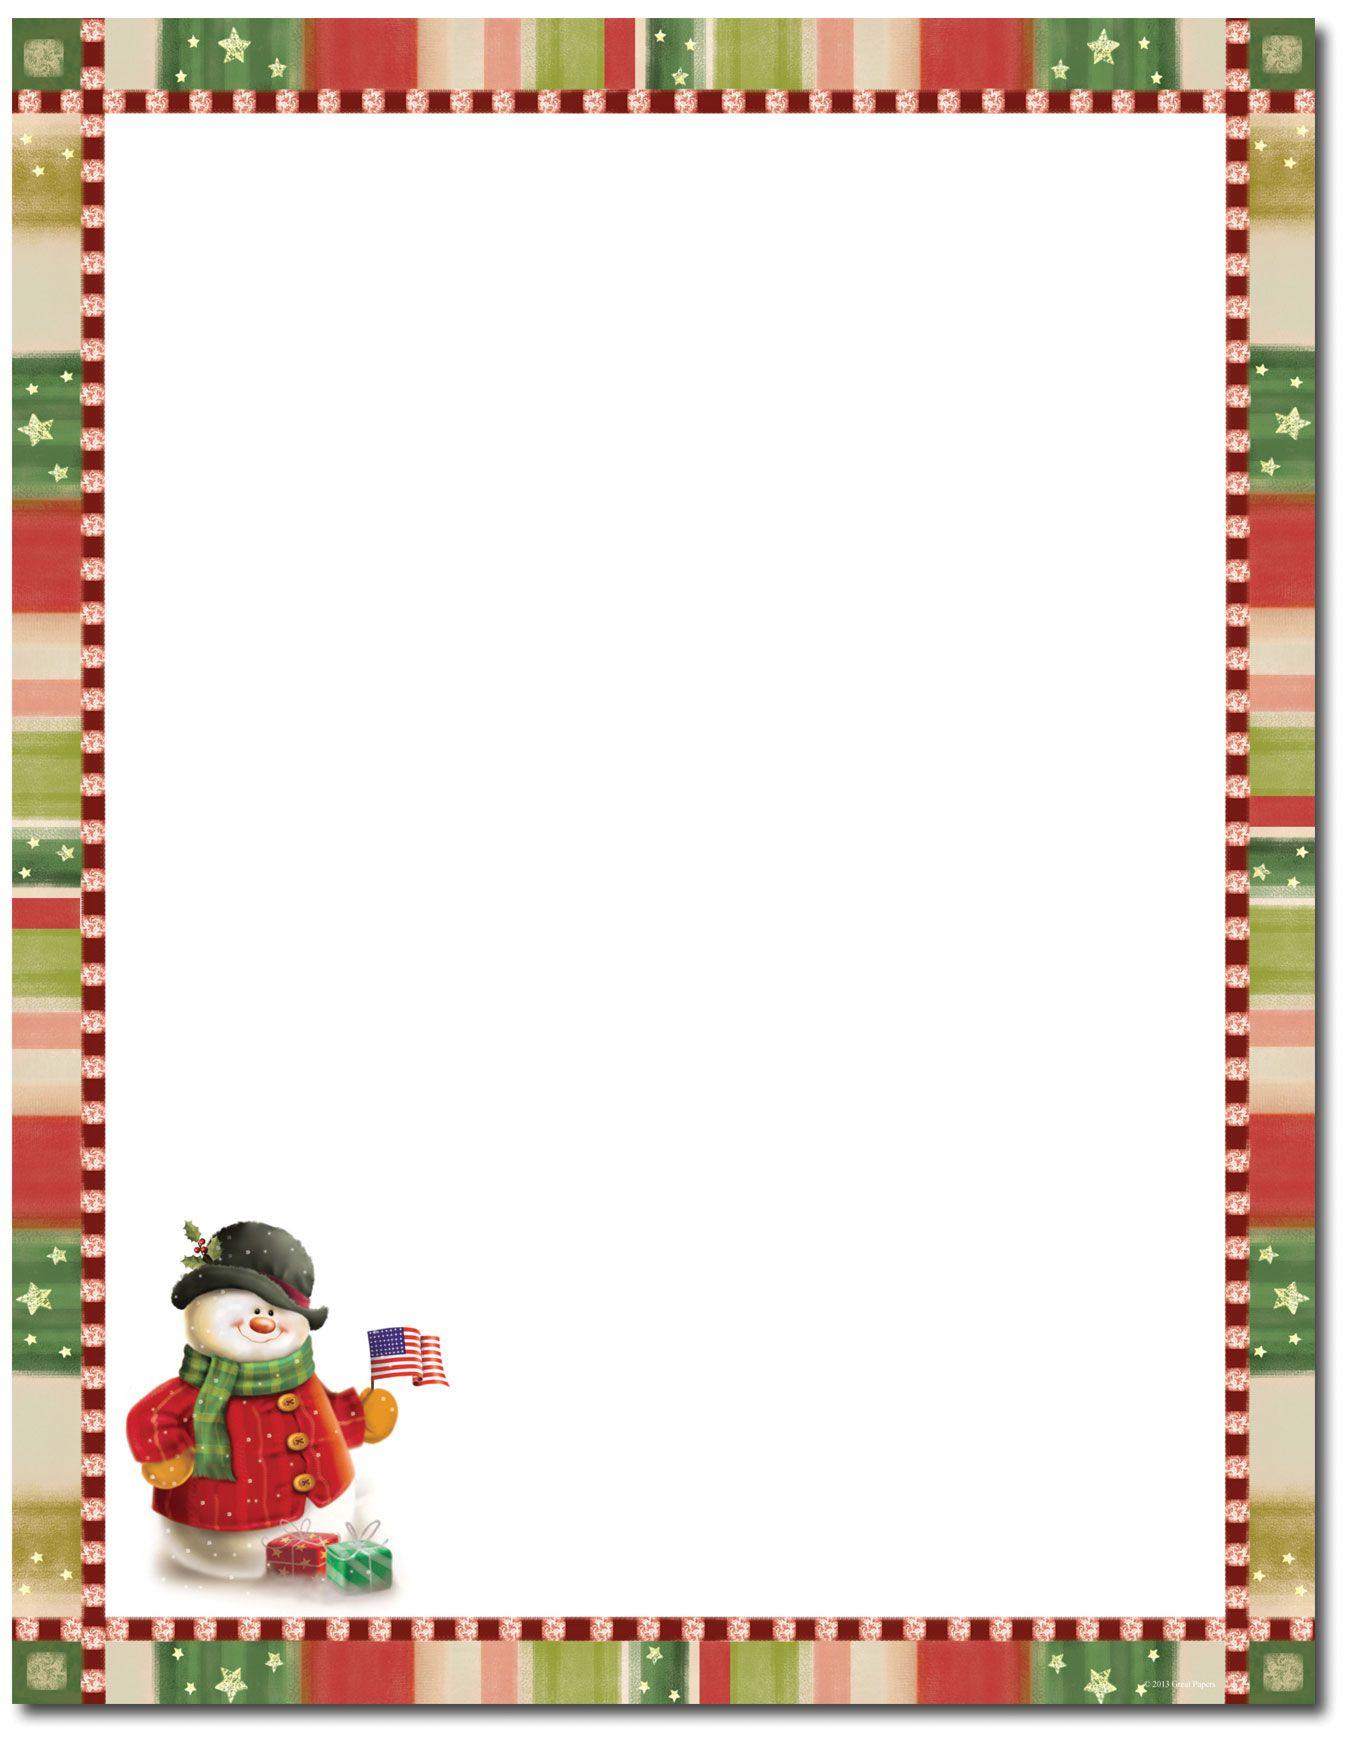 Patriotic Snowman Letterhead | Christmas Stationery | Christmas - Free Printable Snowman Stationery